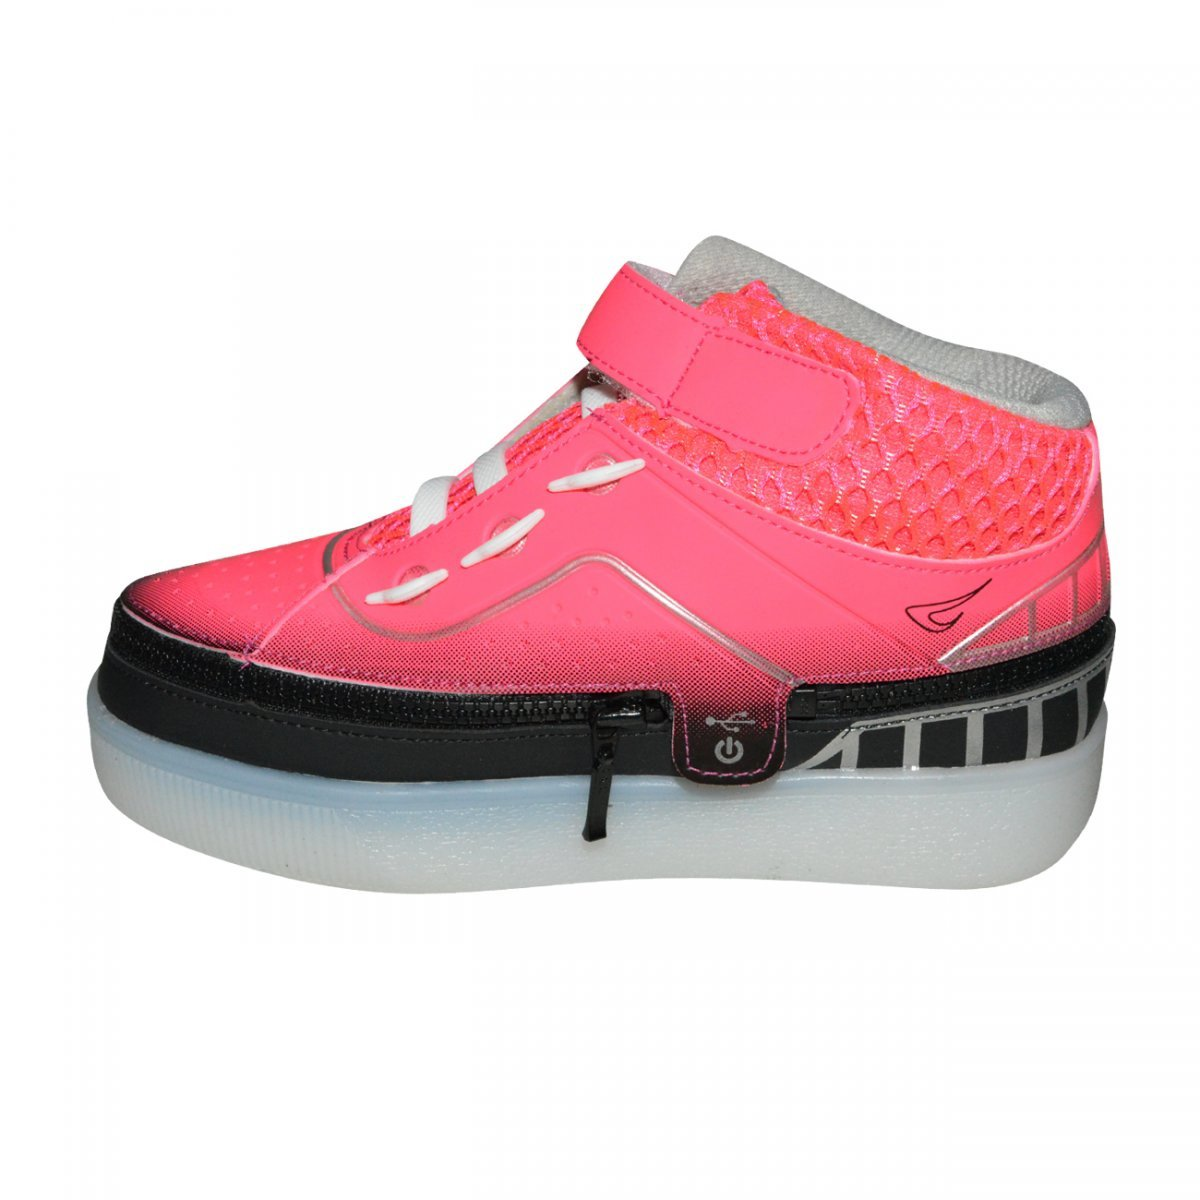 Zip e Max Tênis Tênis Ortope Pink Preto Ortope q1Rtvw